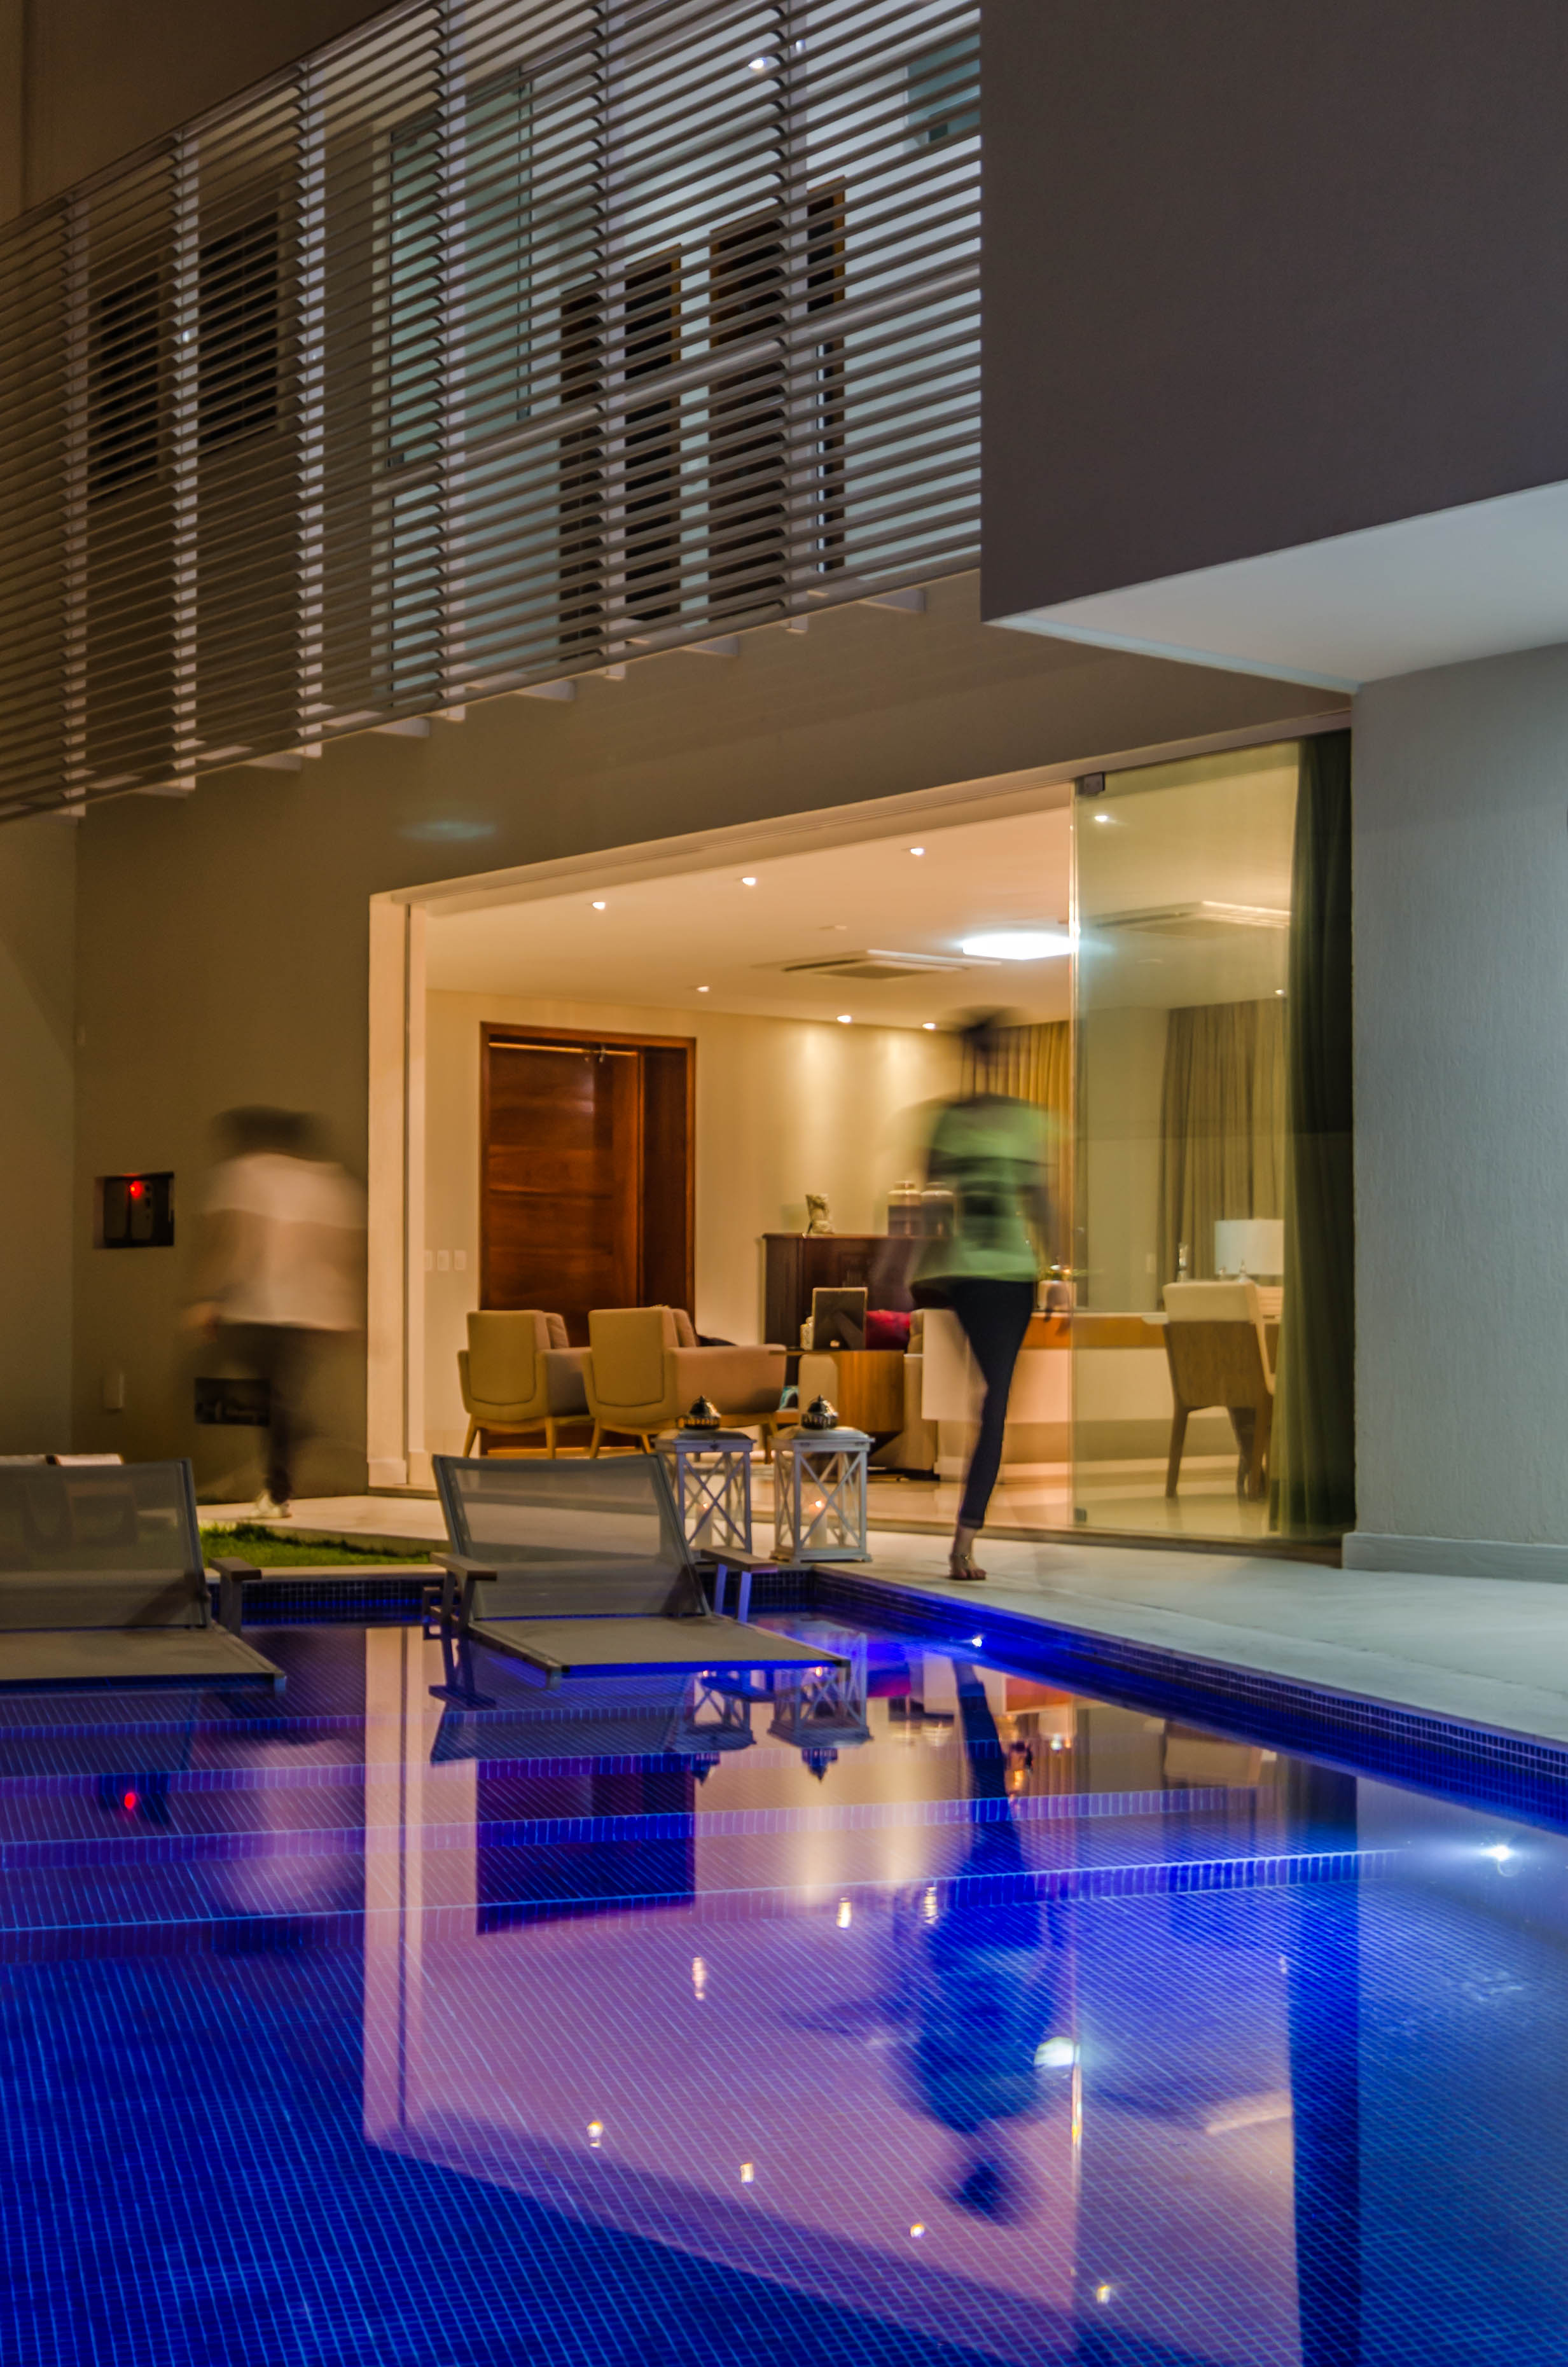 projeto-arquitetonico-edenio-duo-arquitetura-casa-016.jpg